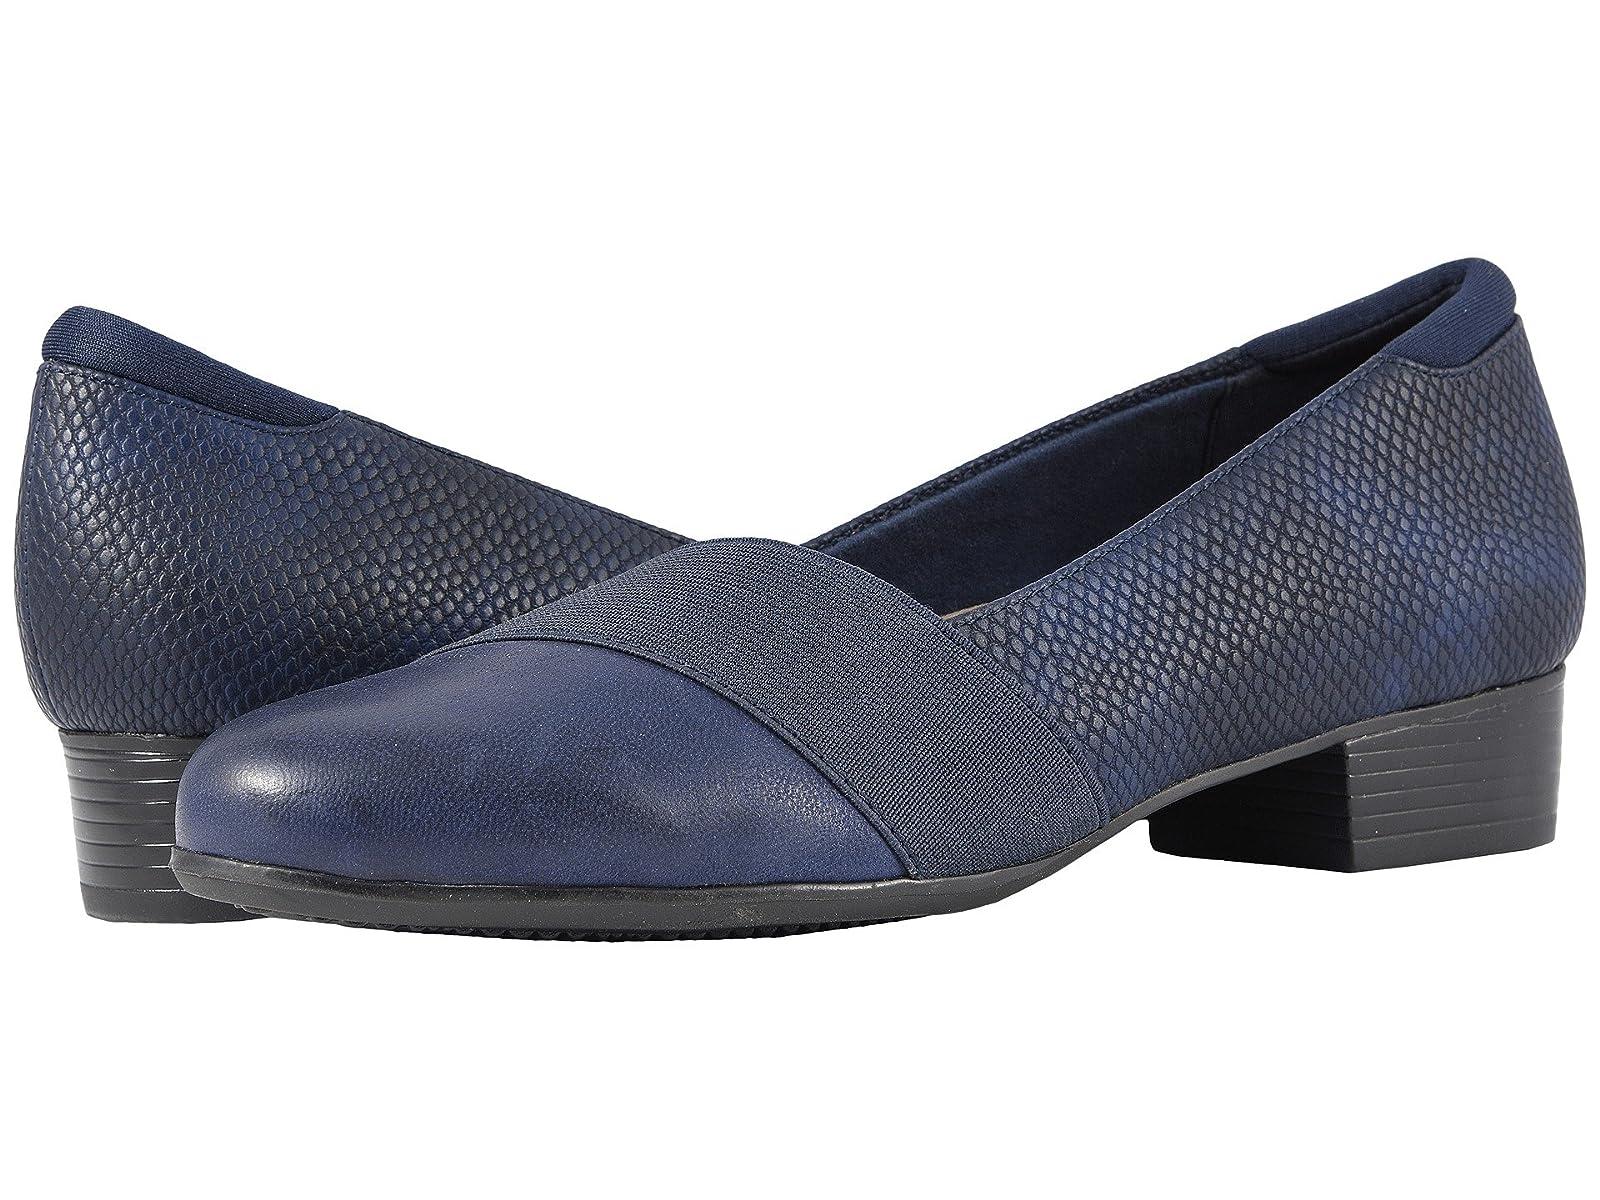 Trotters MelindaAtmospheric grades have affordable shoes